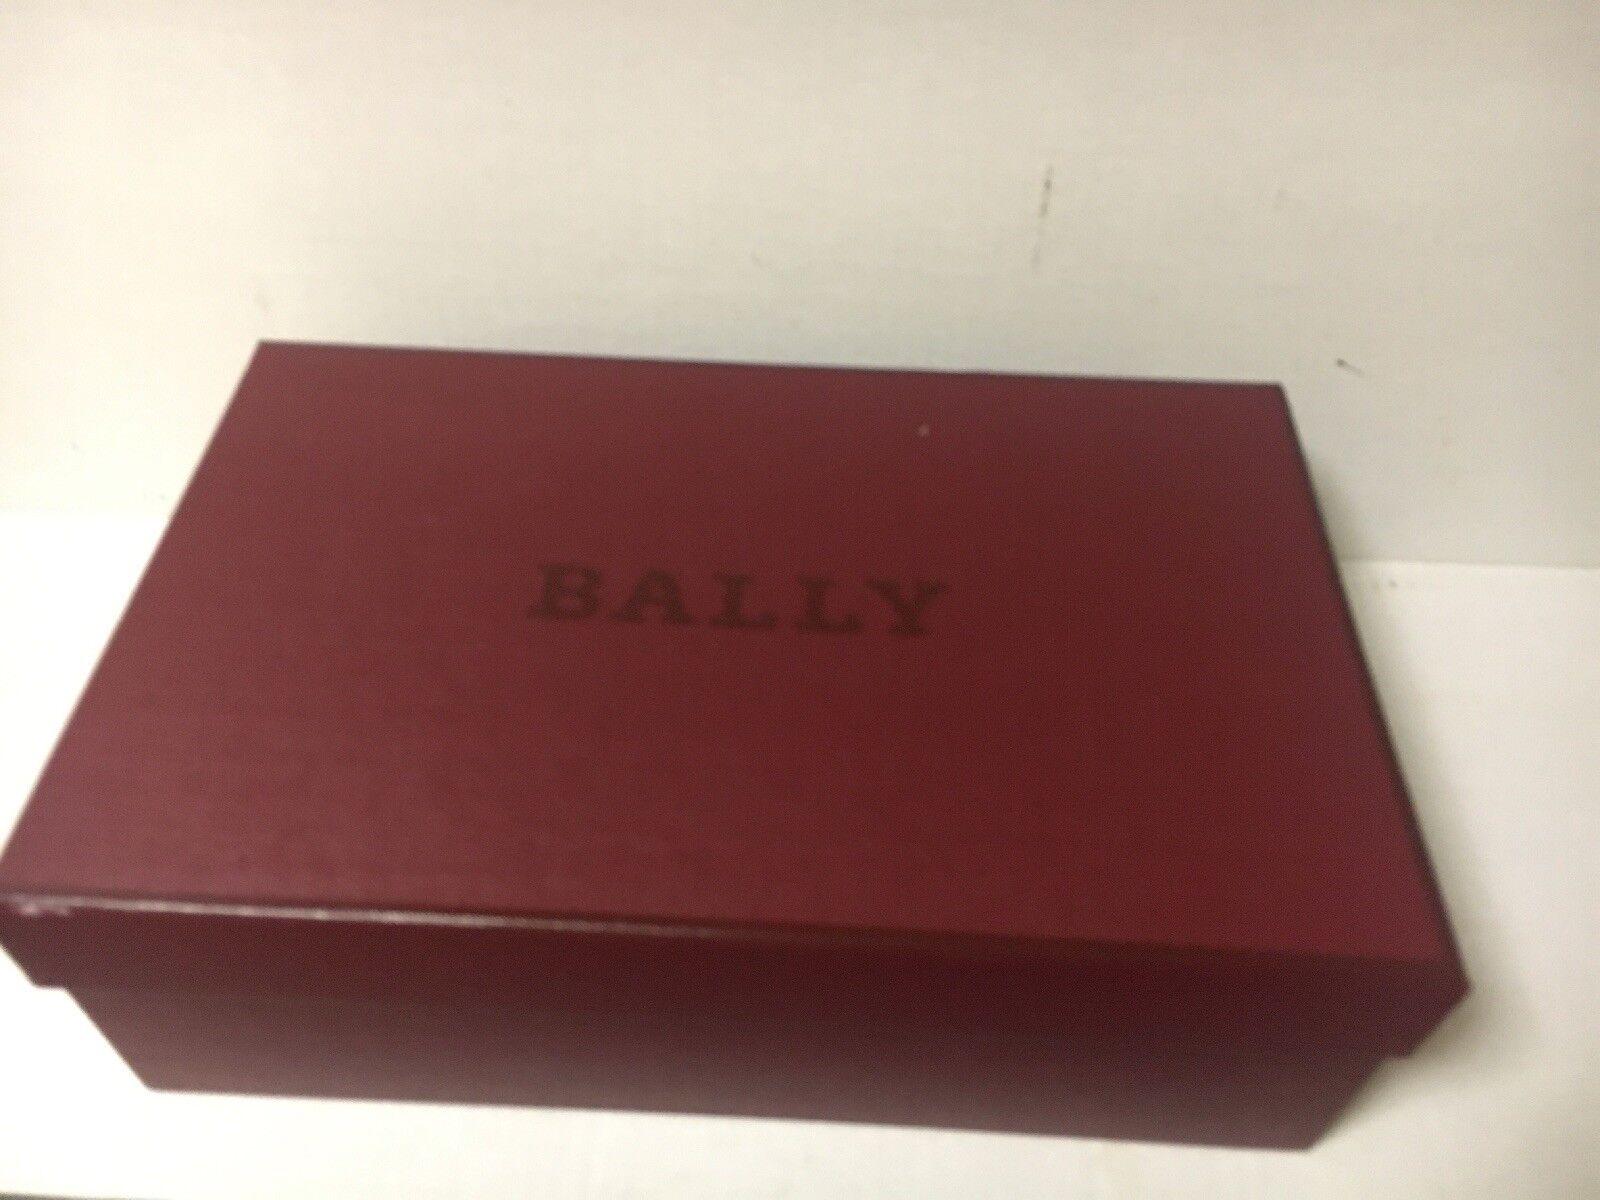 NEW Women's Bally Bally Bally Henrika Silver Goat Metallic US 8.5, EU 39 4fbea7